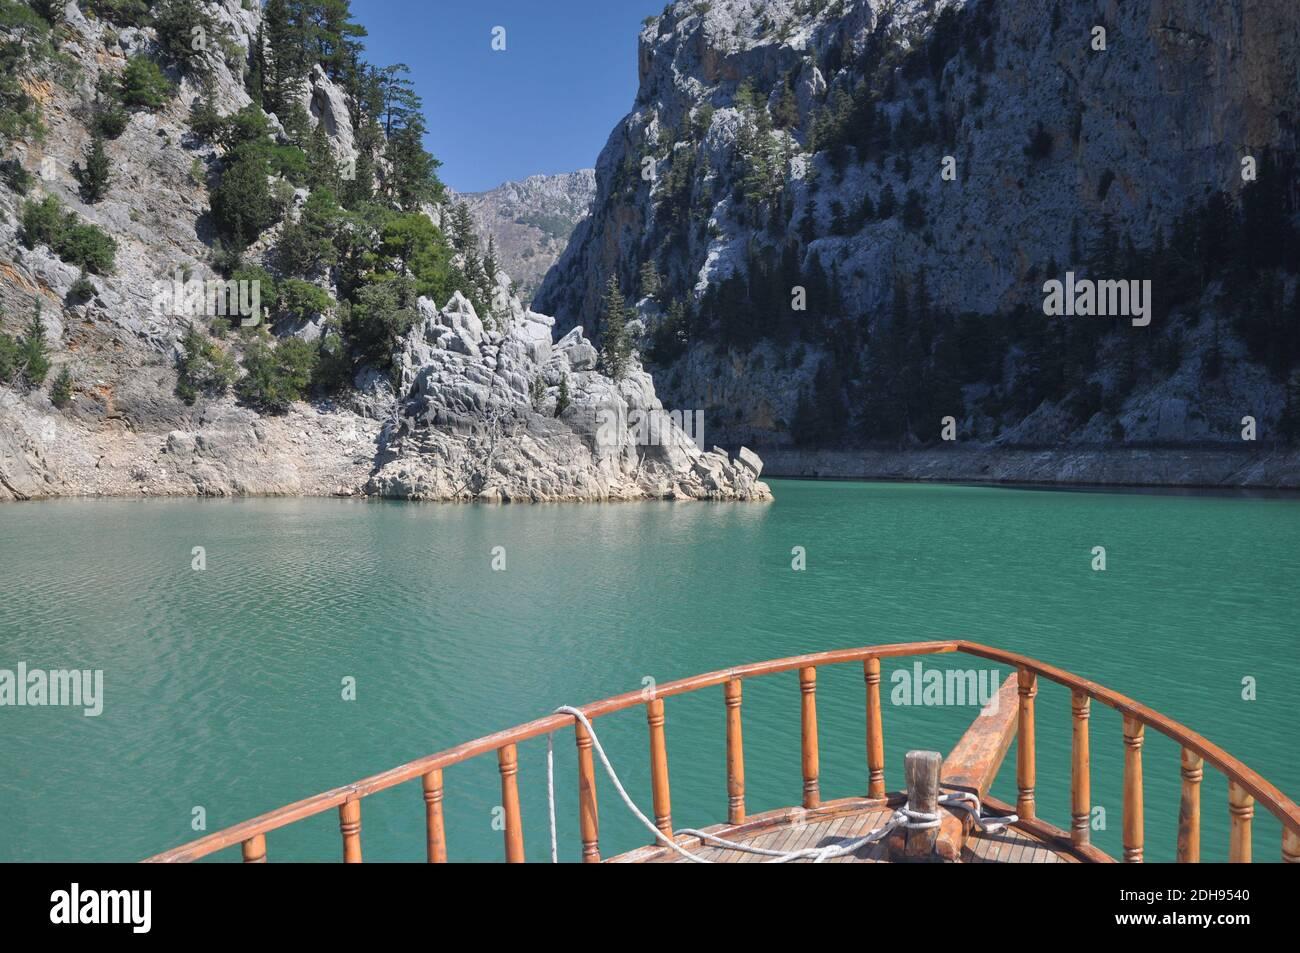 Green Canyon, Türkei Stock Photo